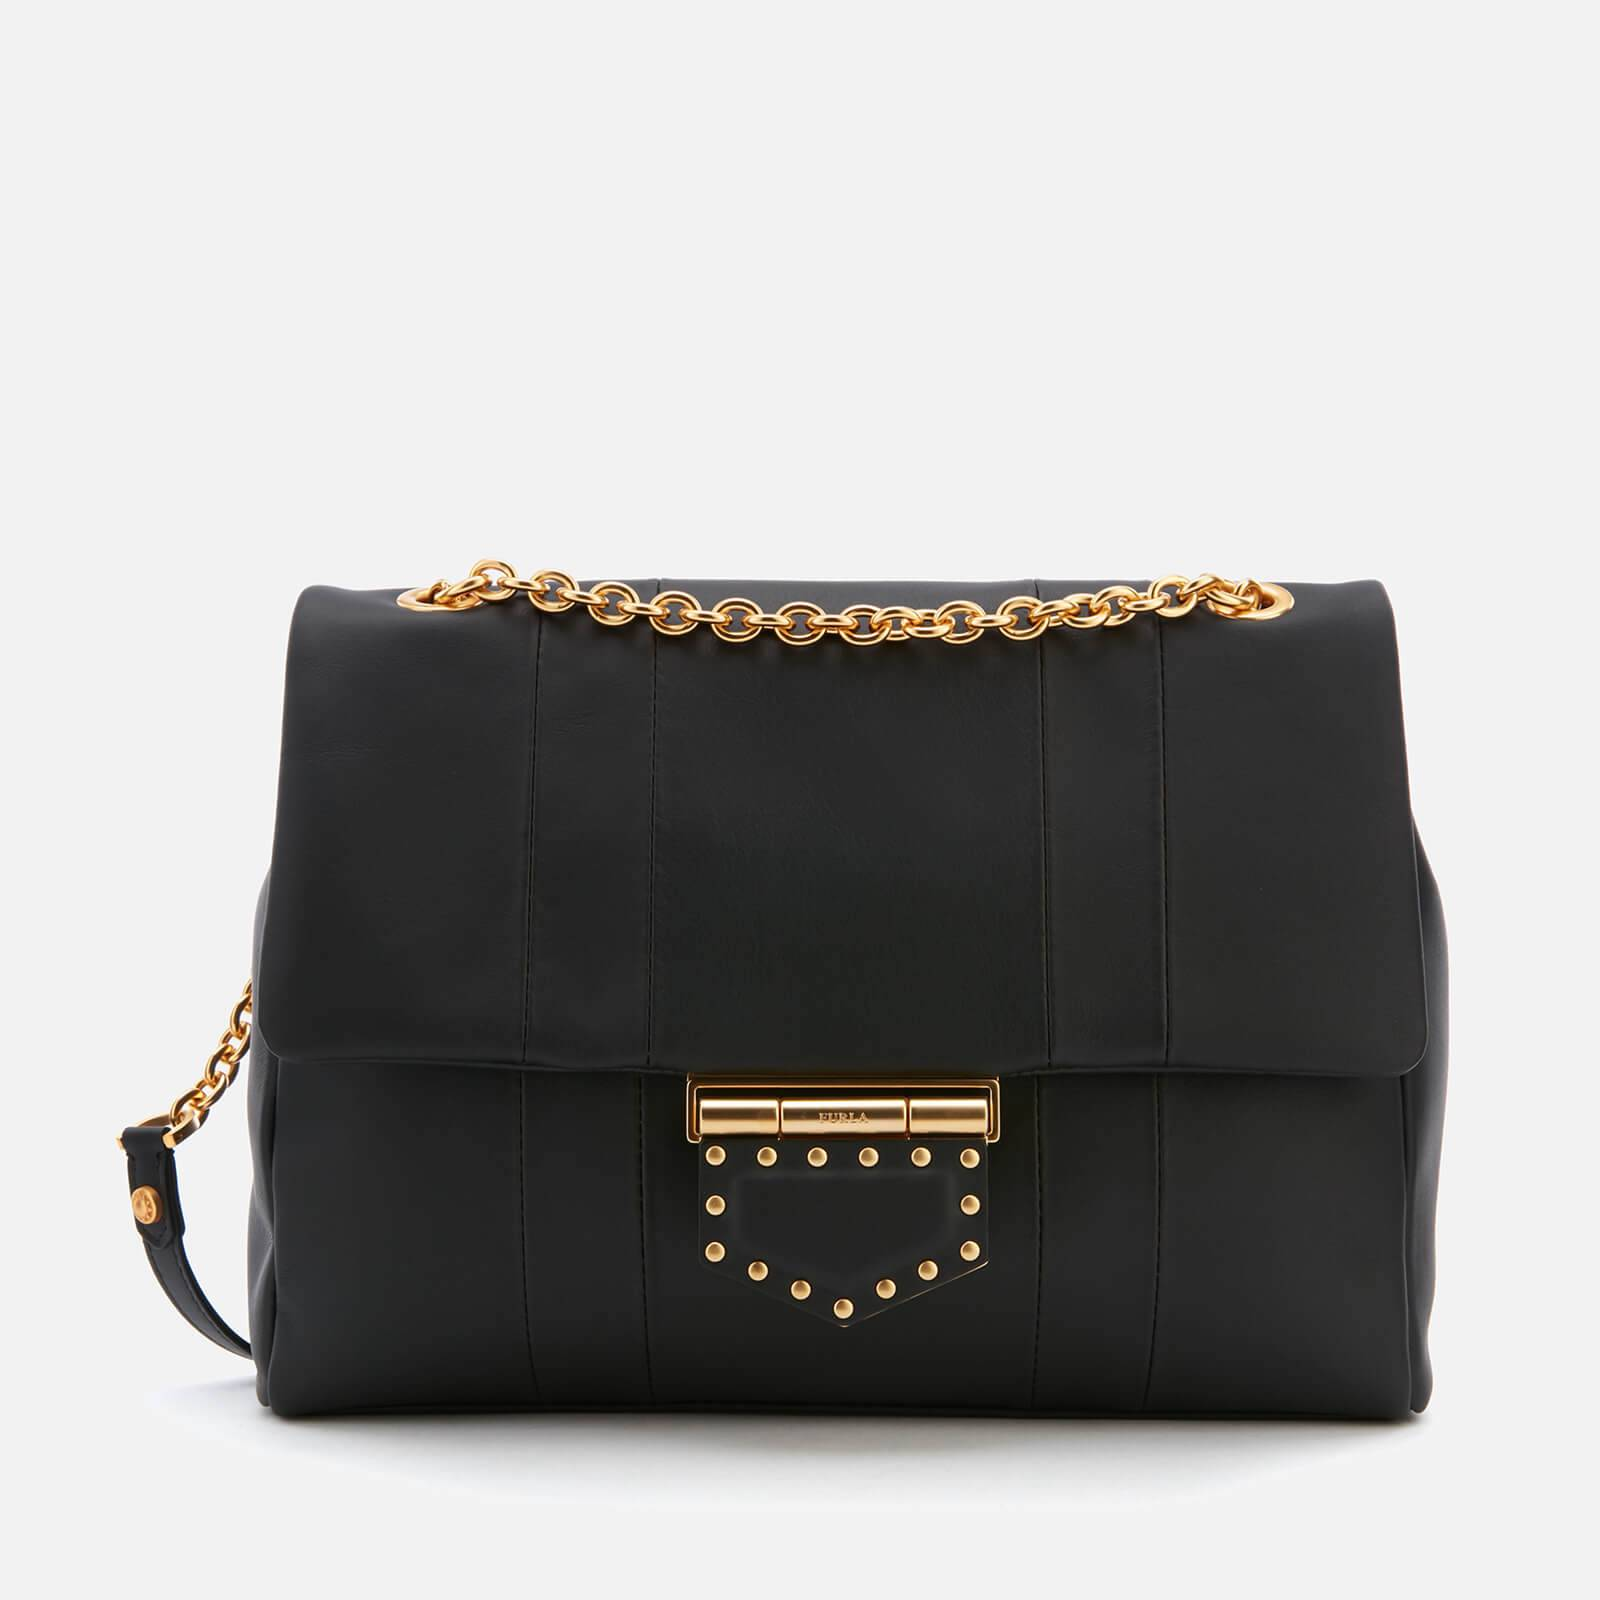 Furla Women's Furla Meridiana Medium Cross Body Bag - Black